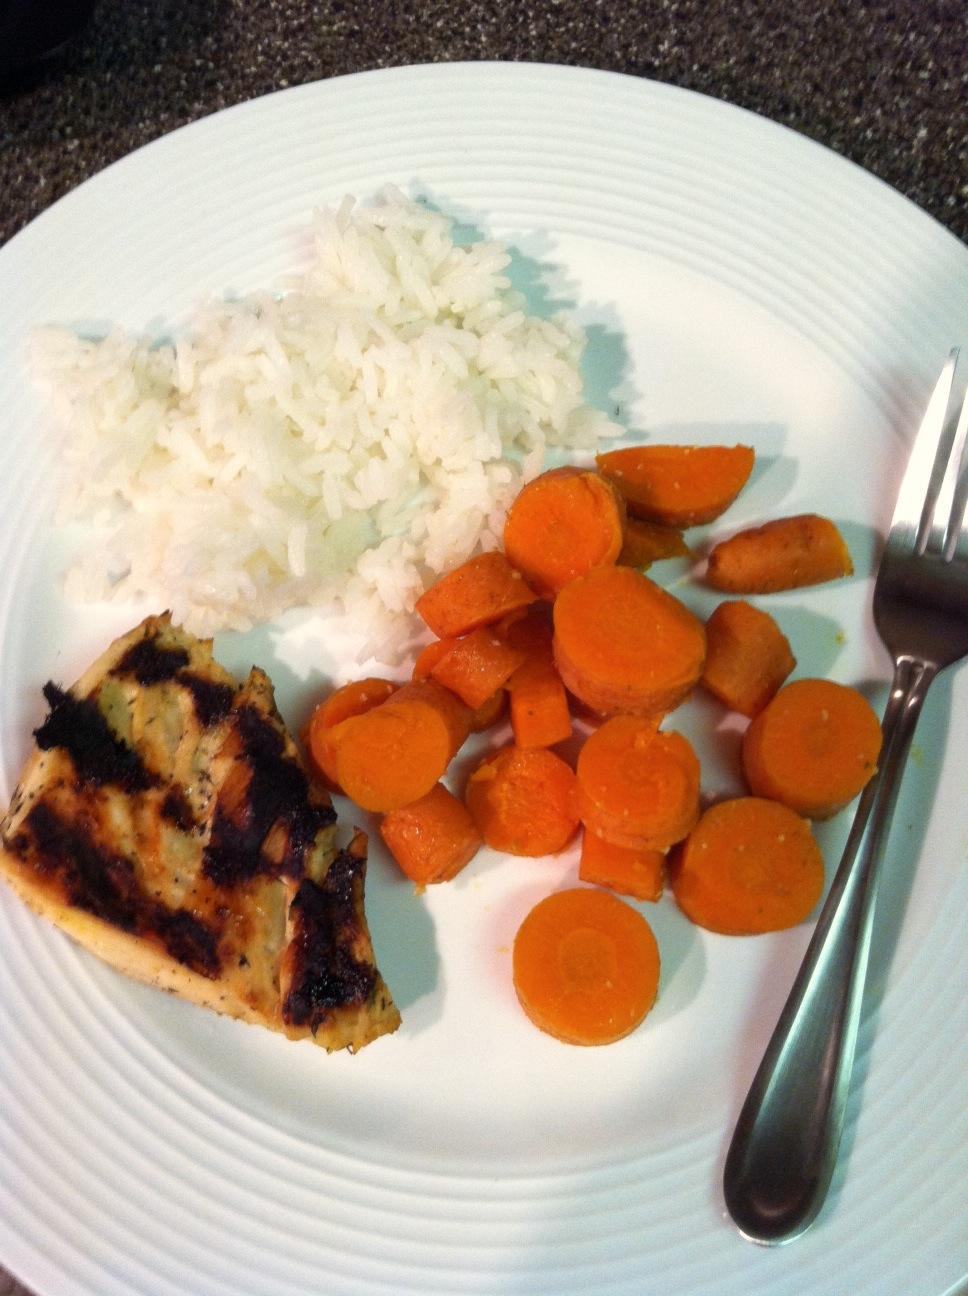 Tonight for Supper: November 7-Grilled Orange Chicken